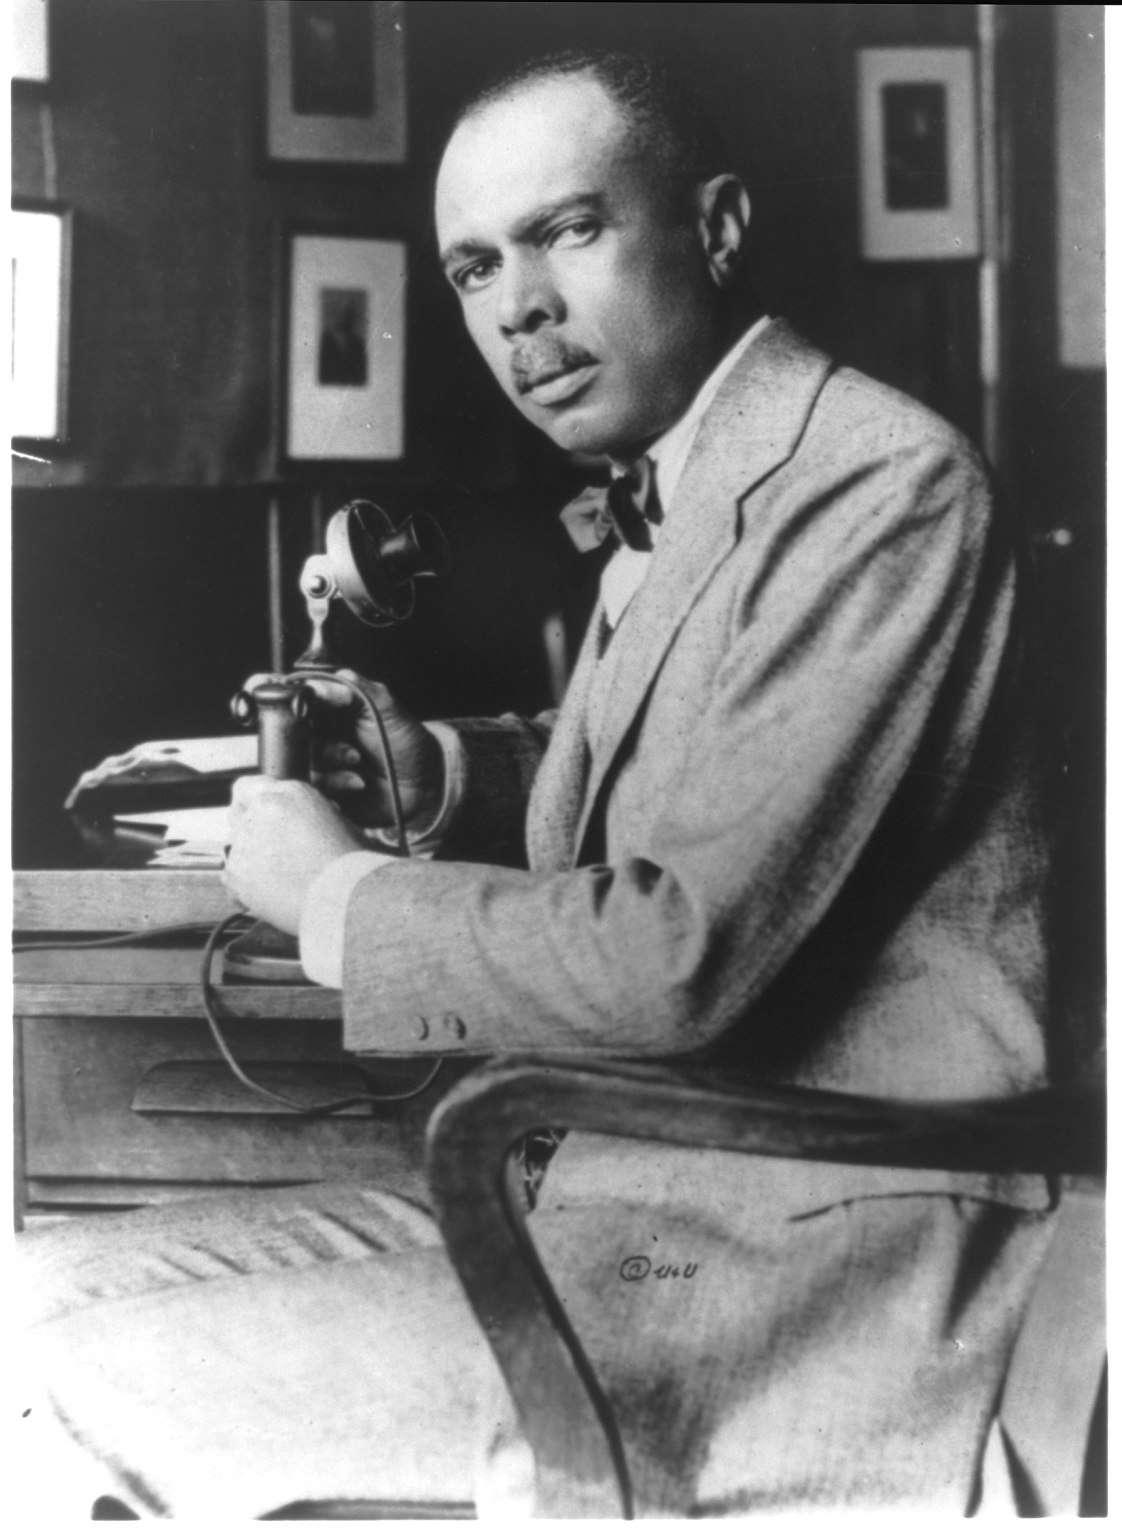 James Weldon Johnson sitting at his desk, black and white photograph.